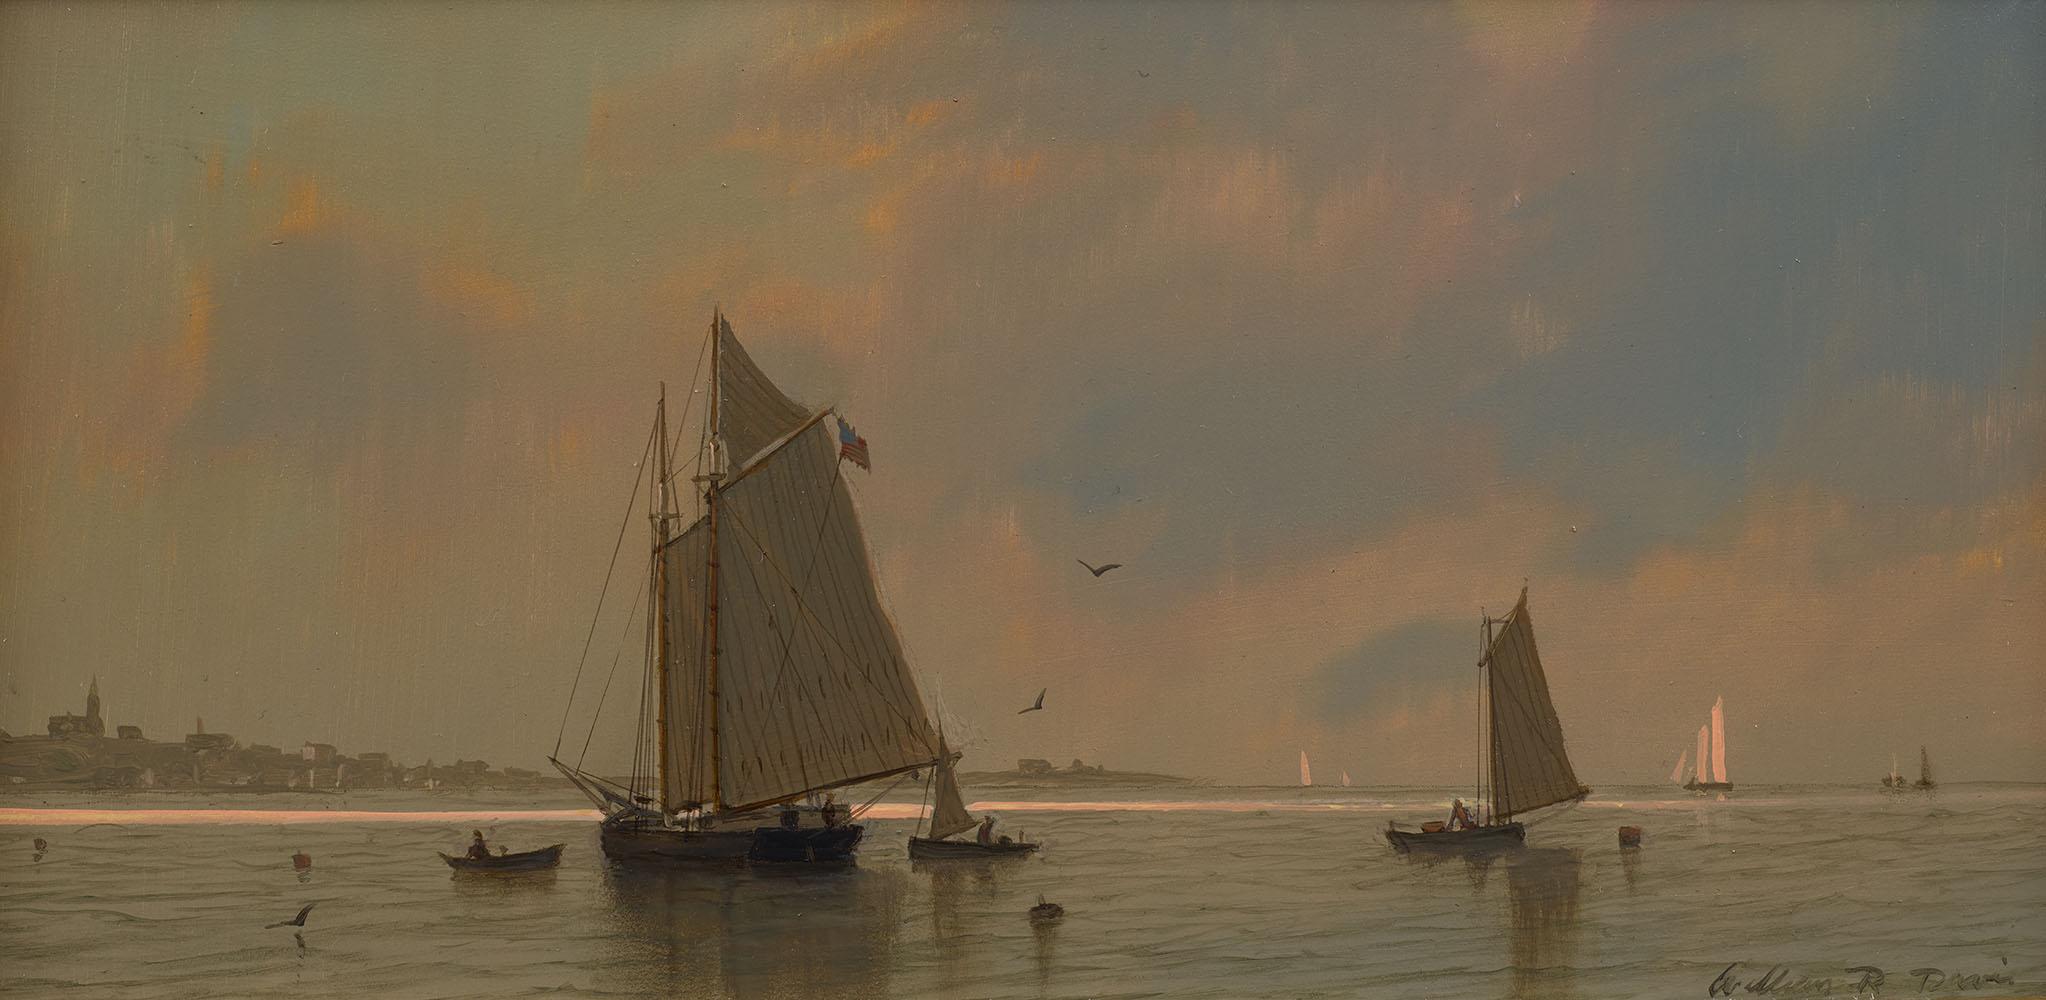 william_davis_wd1005_fishing_schooner_at_work.jpg